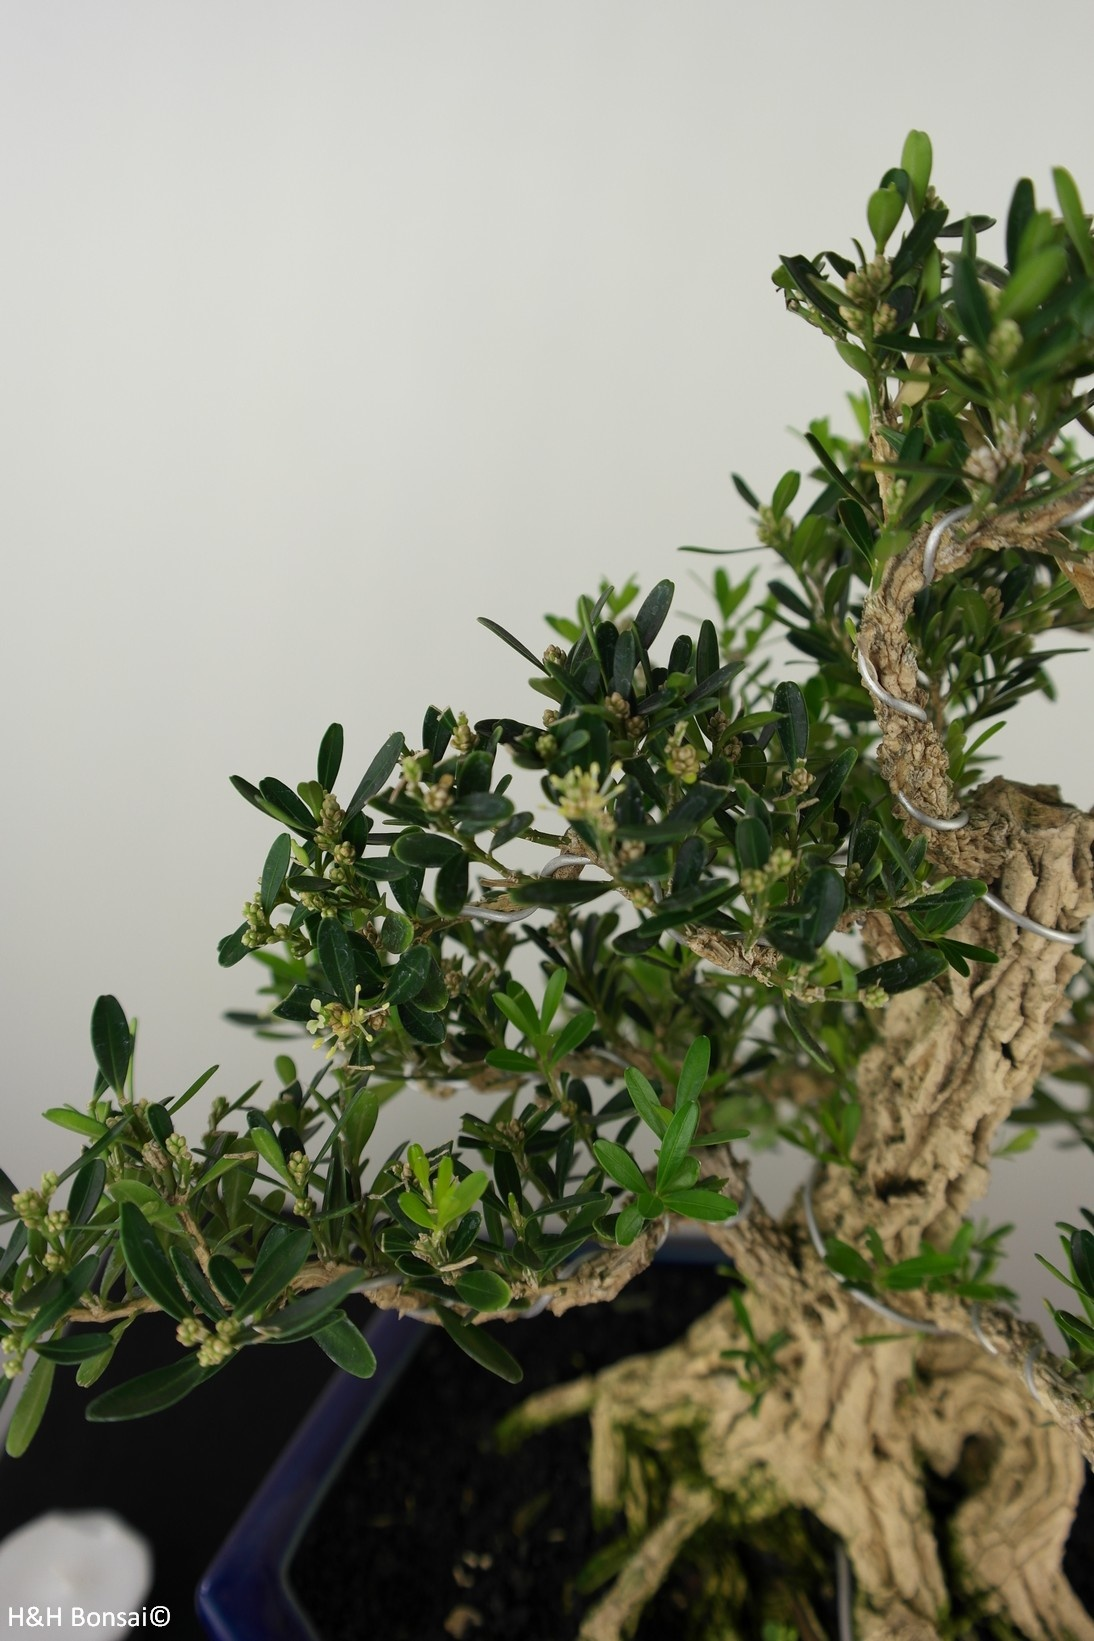 Bonsai Buchsbaum, Buxus harlandii, nr. 7685